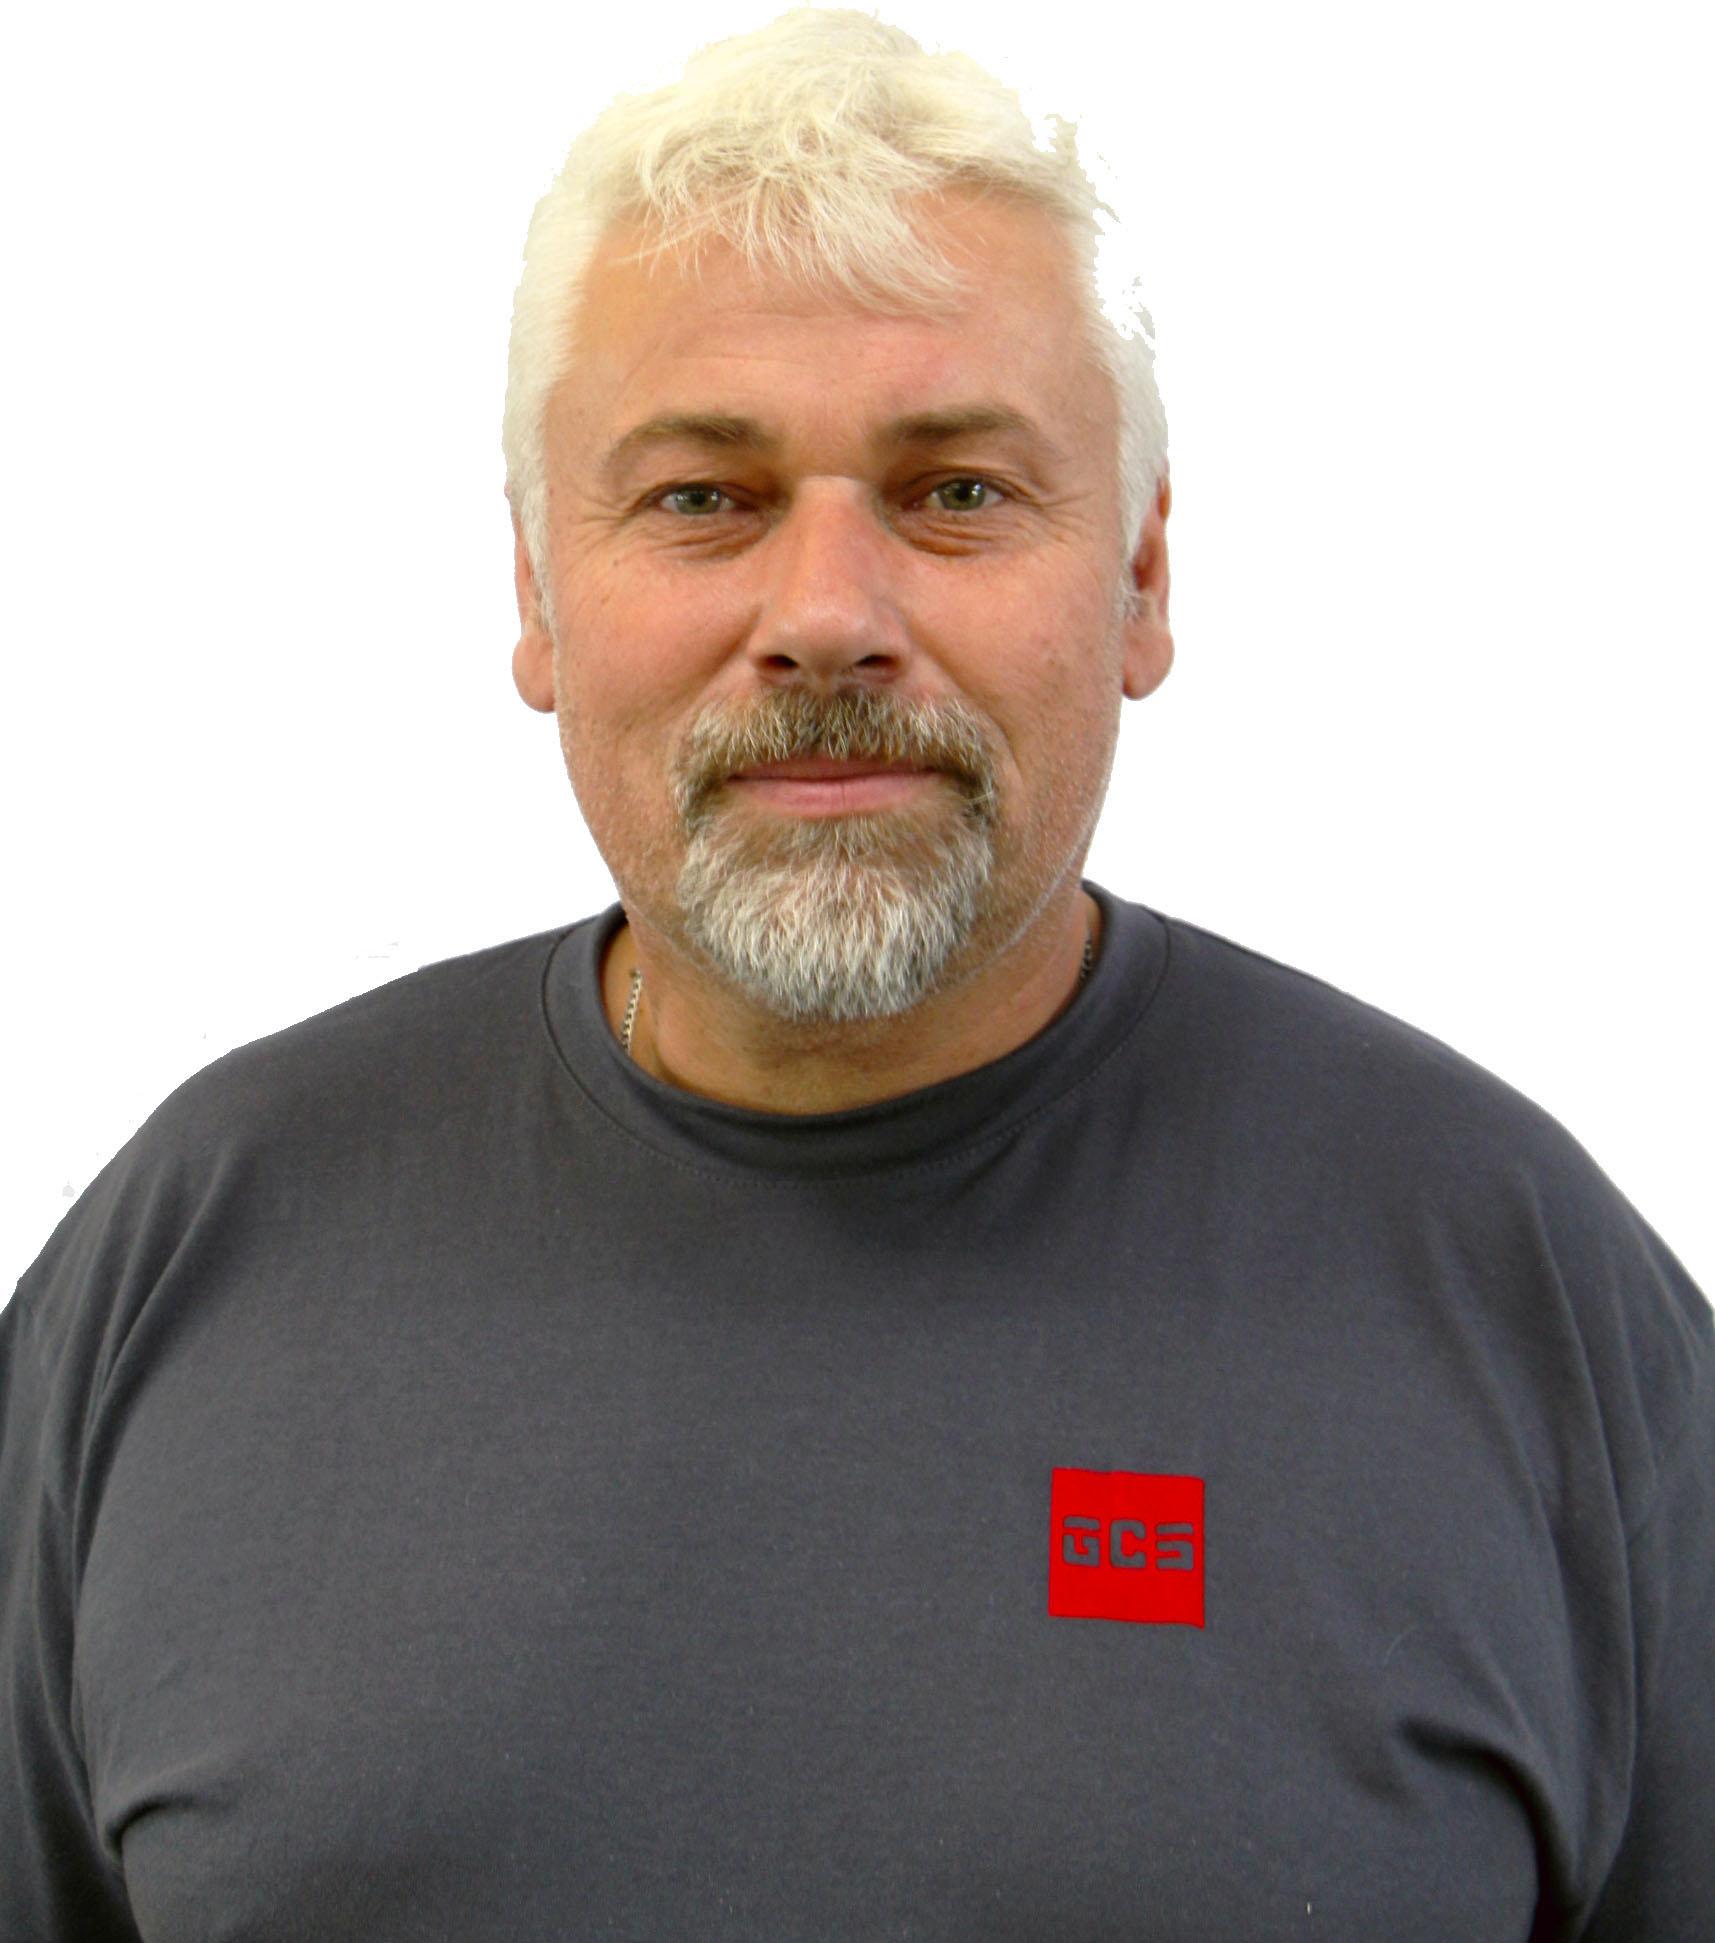 Veljko Celar, Mechanic